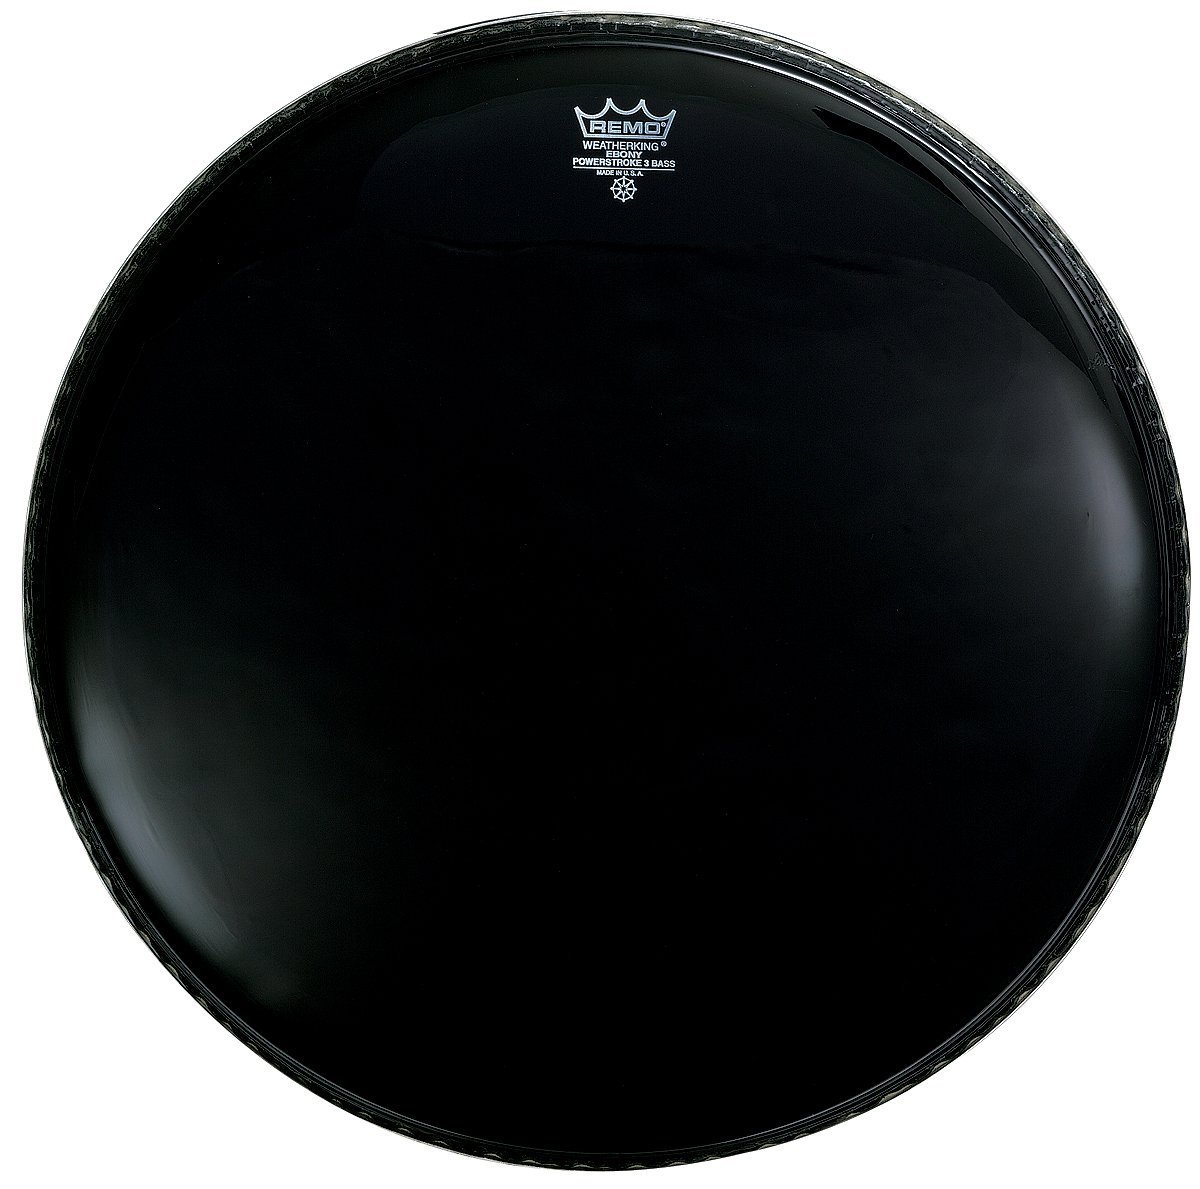 Remo P31022-ES 22-inch Bass Drum Heads KMC Music Inc